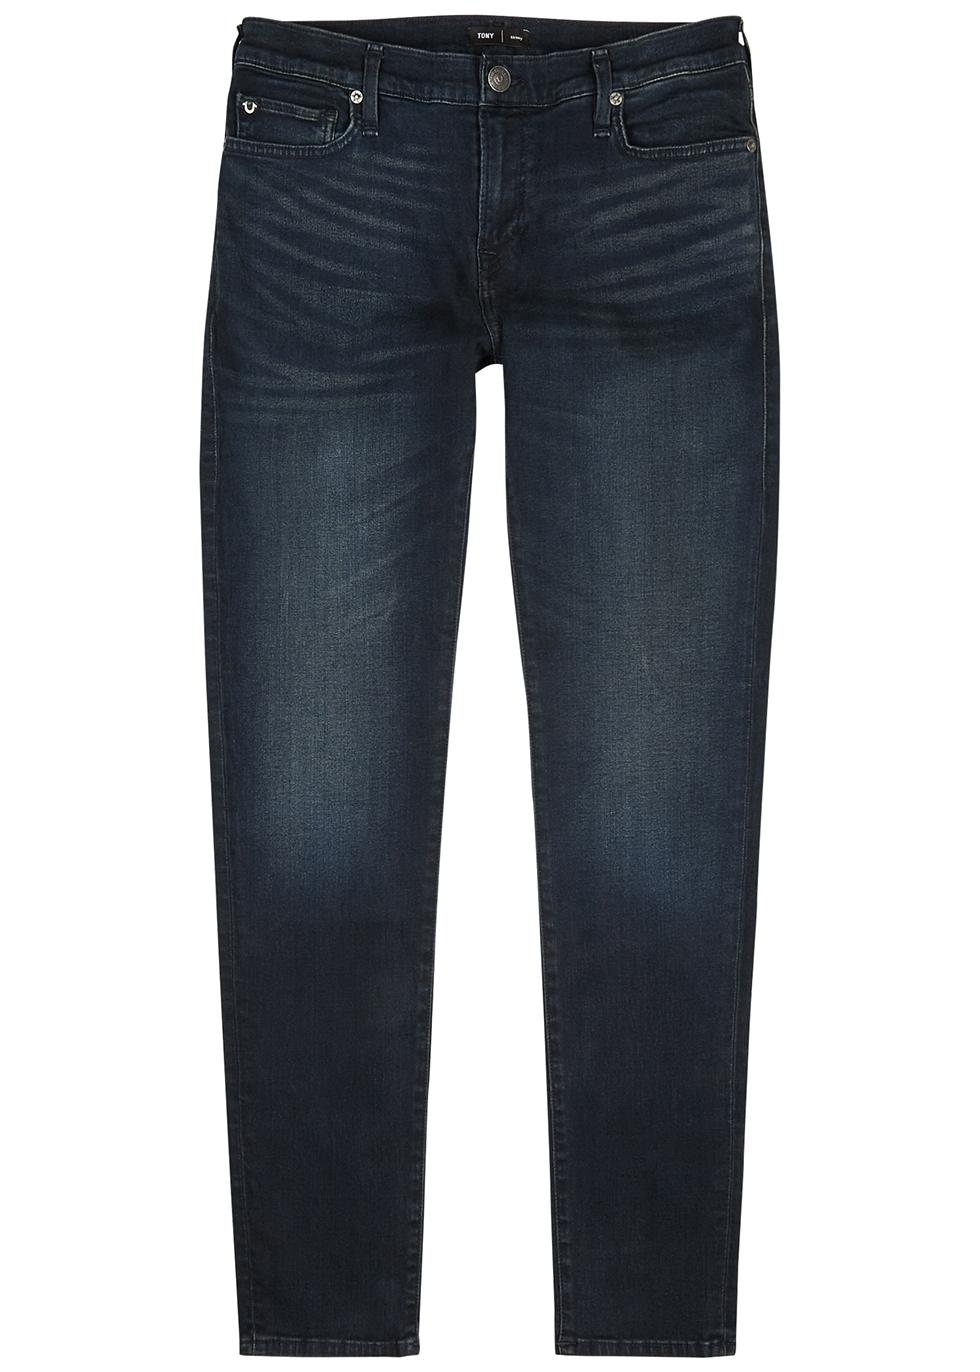 Tony dark blue skinny jeans